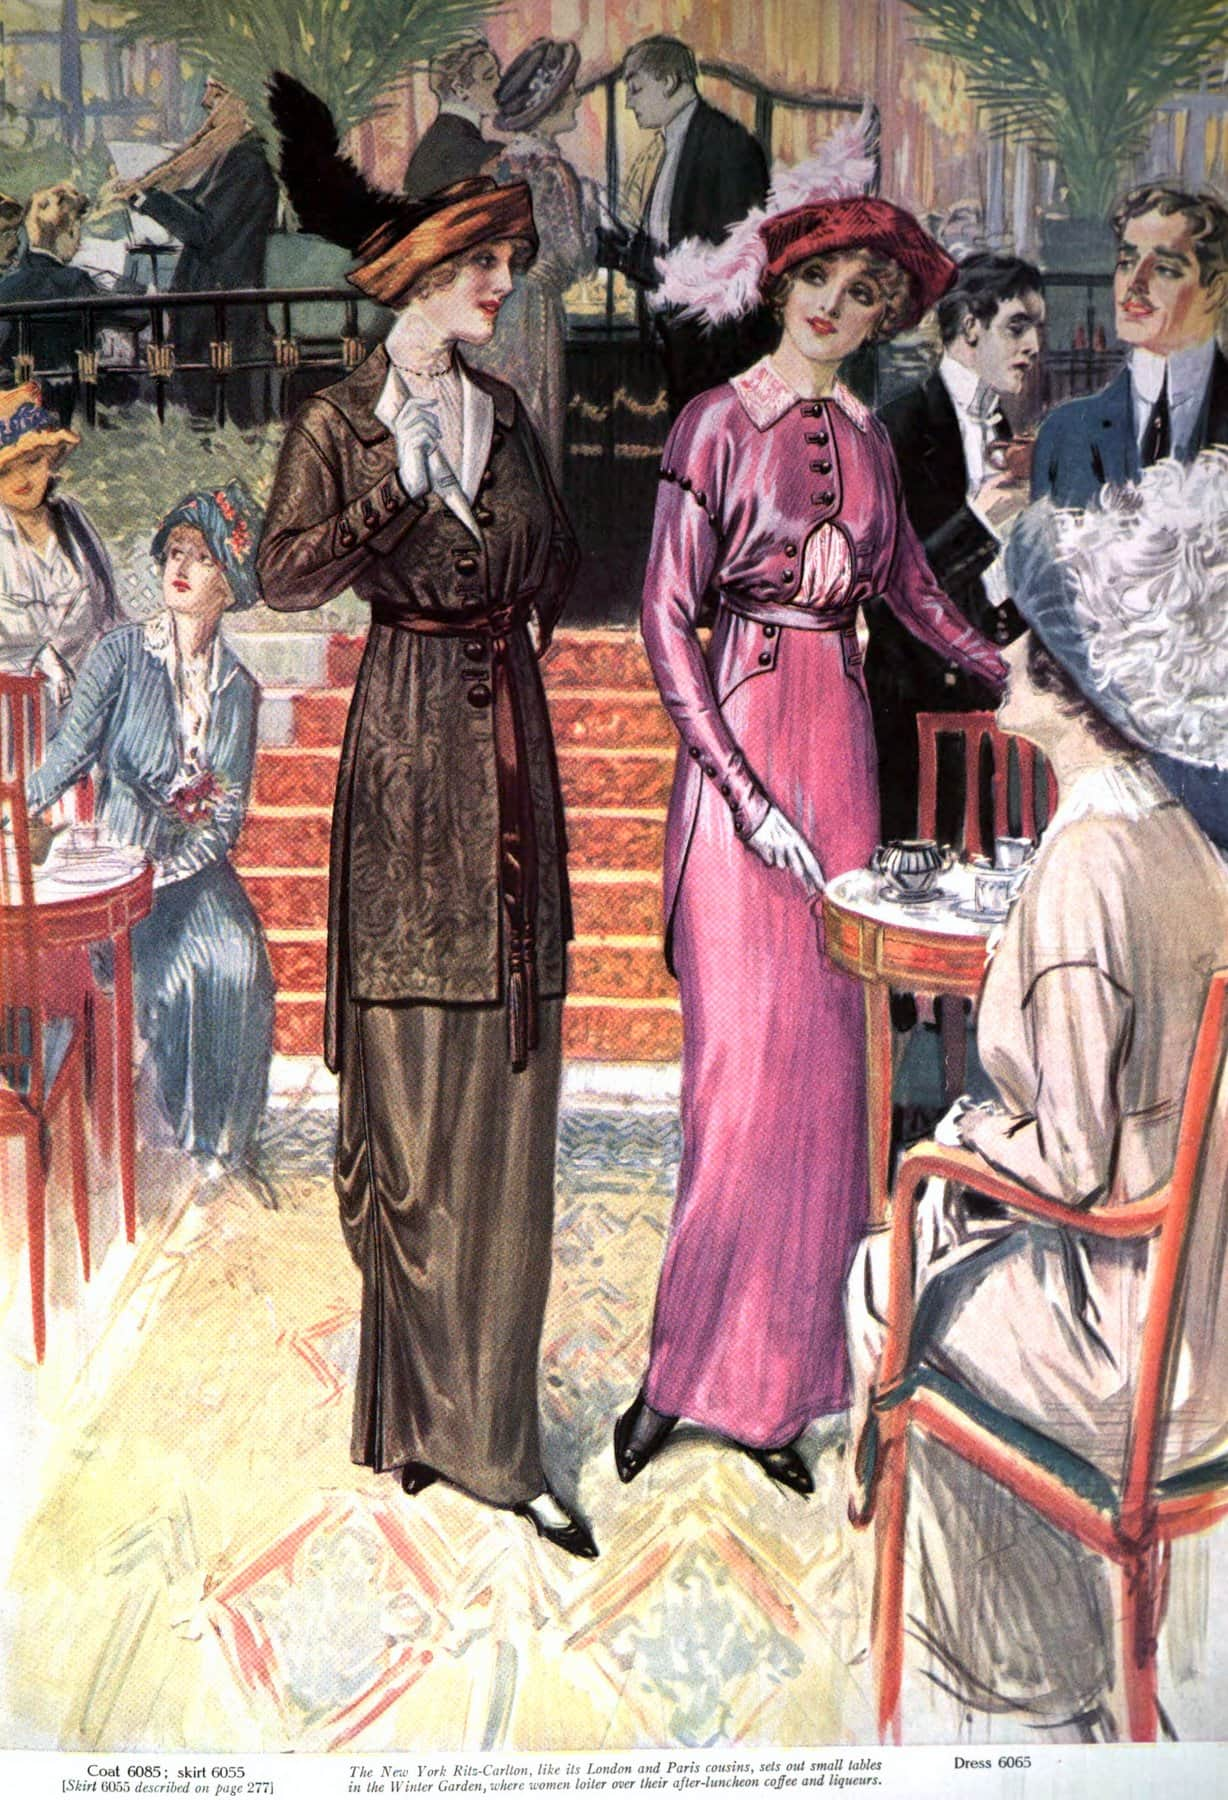 New York Ritz Carlton 1913 - ClickAmericana com